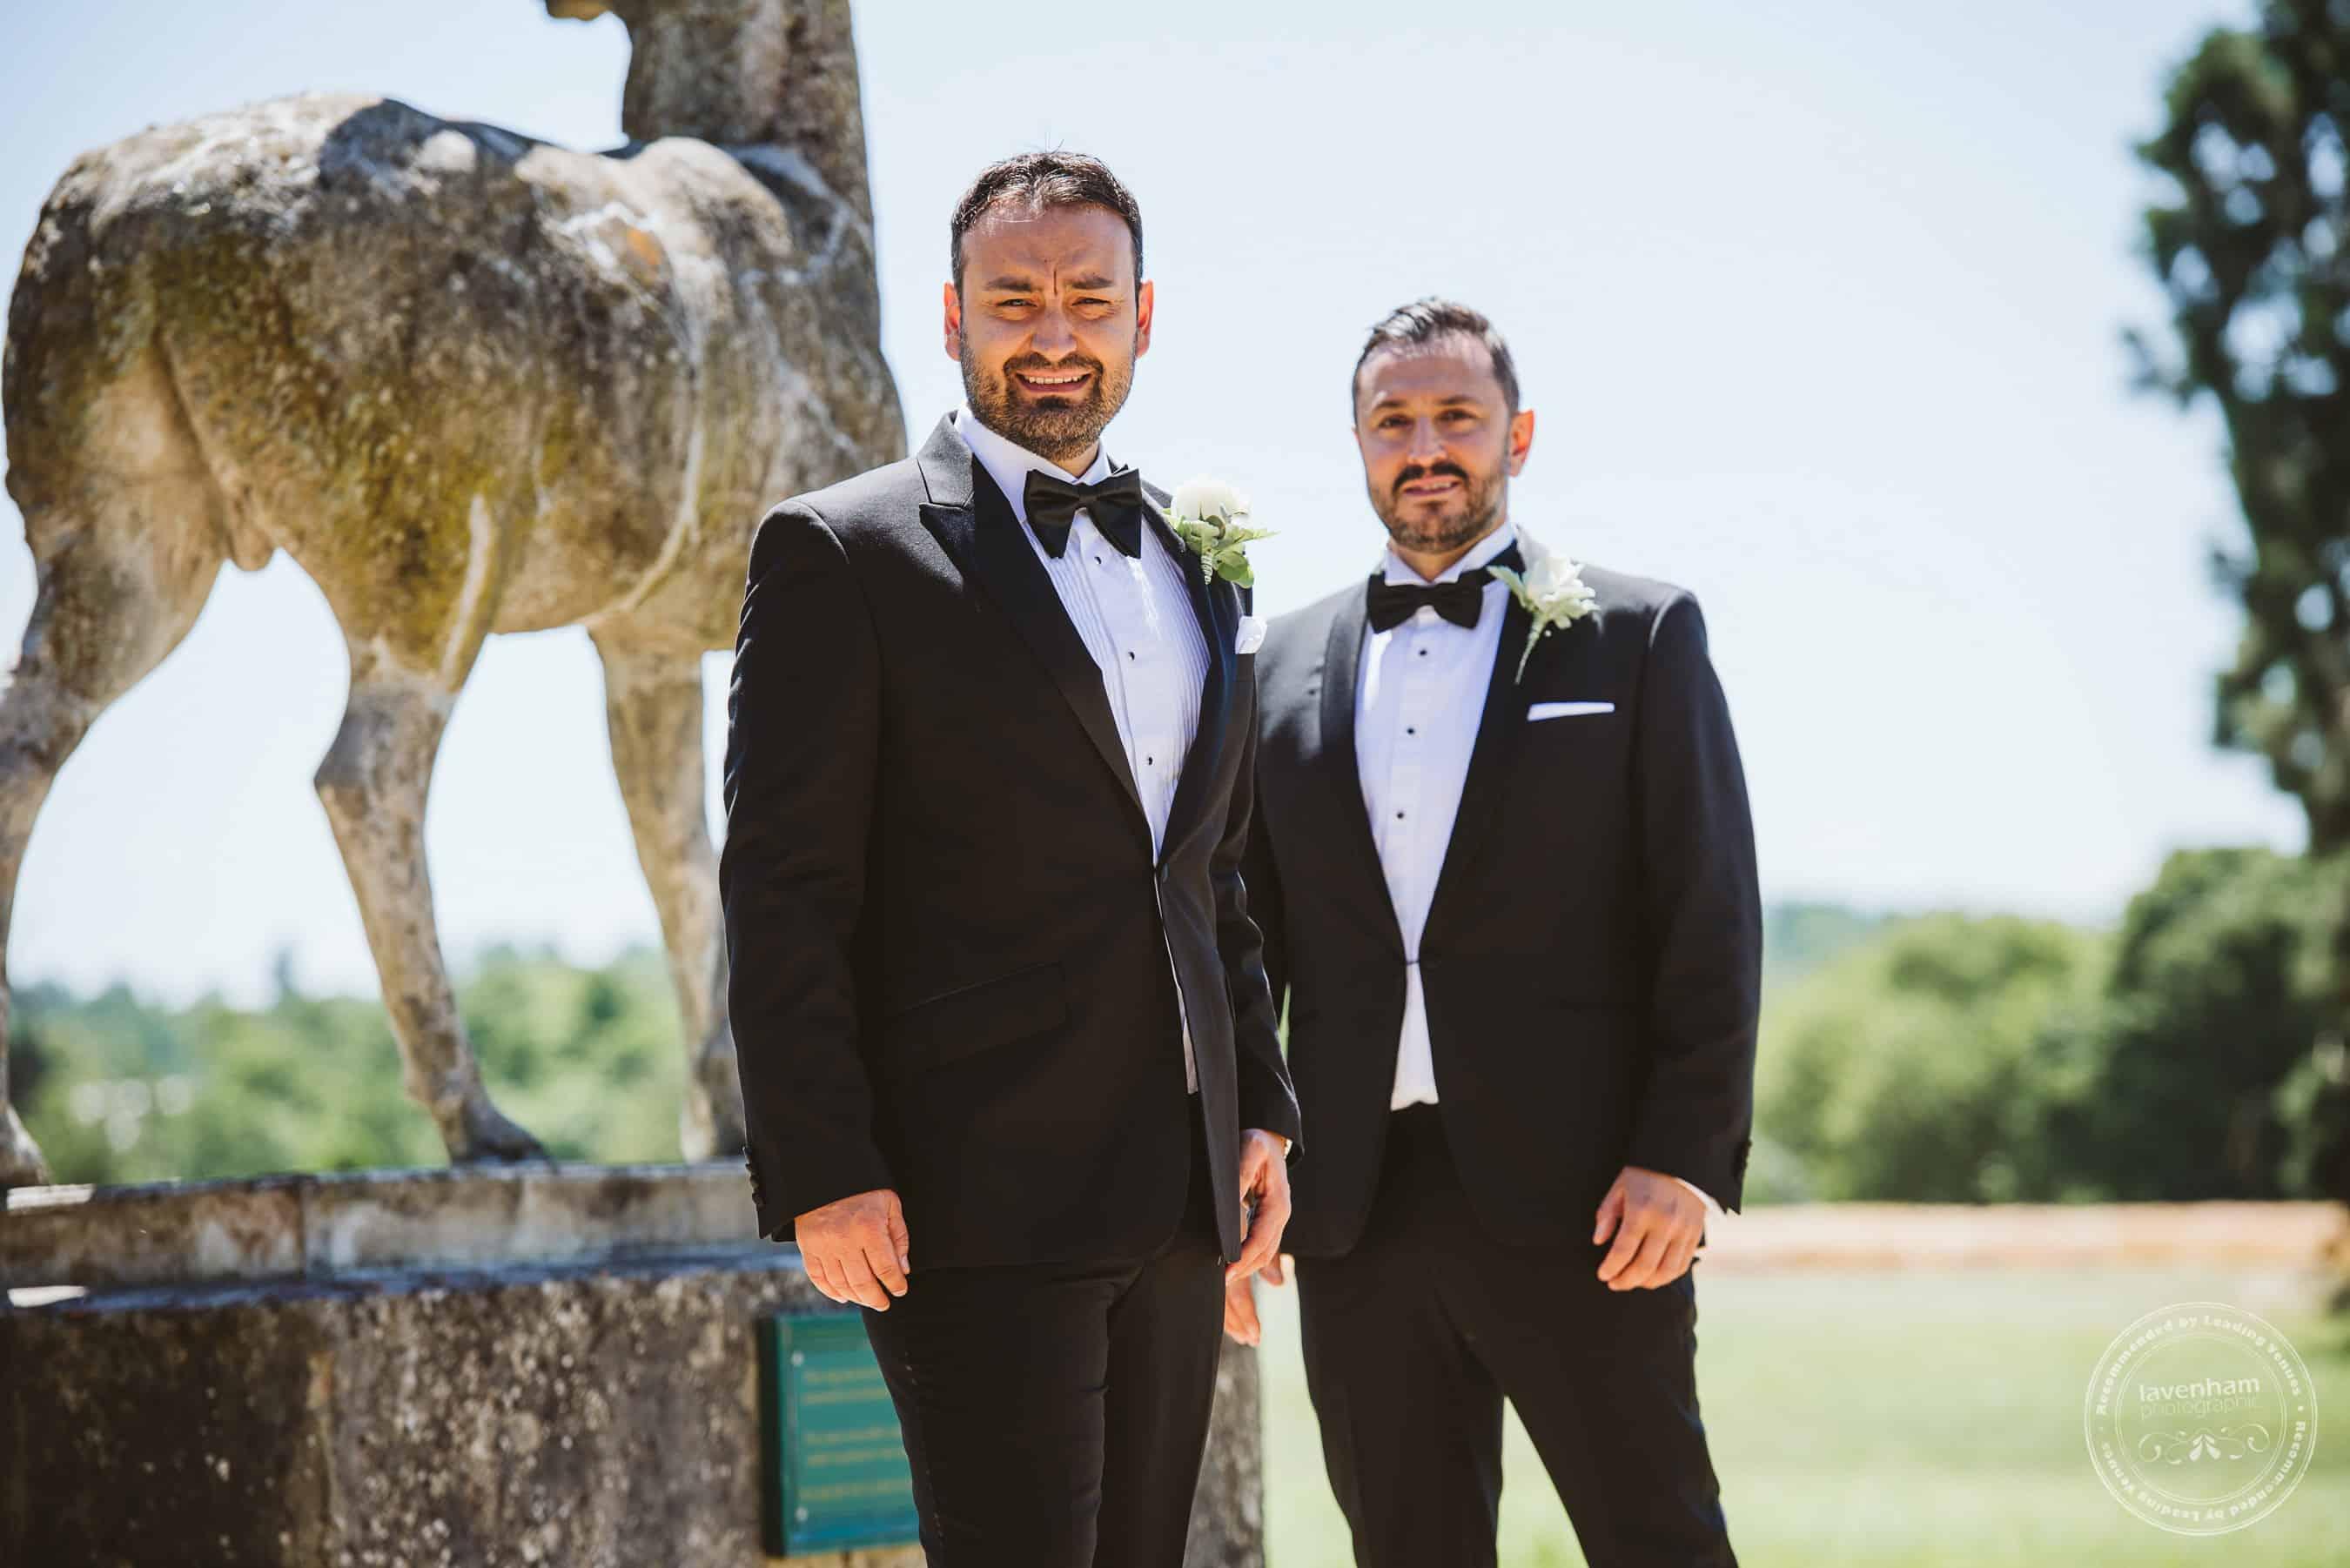 220618 Gosfield Hall Wedding Photography Lavenham Photographic 0036